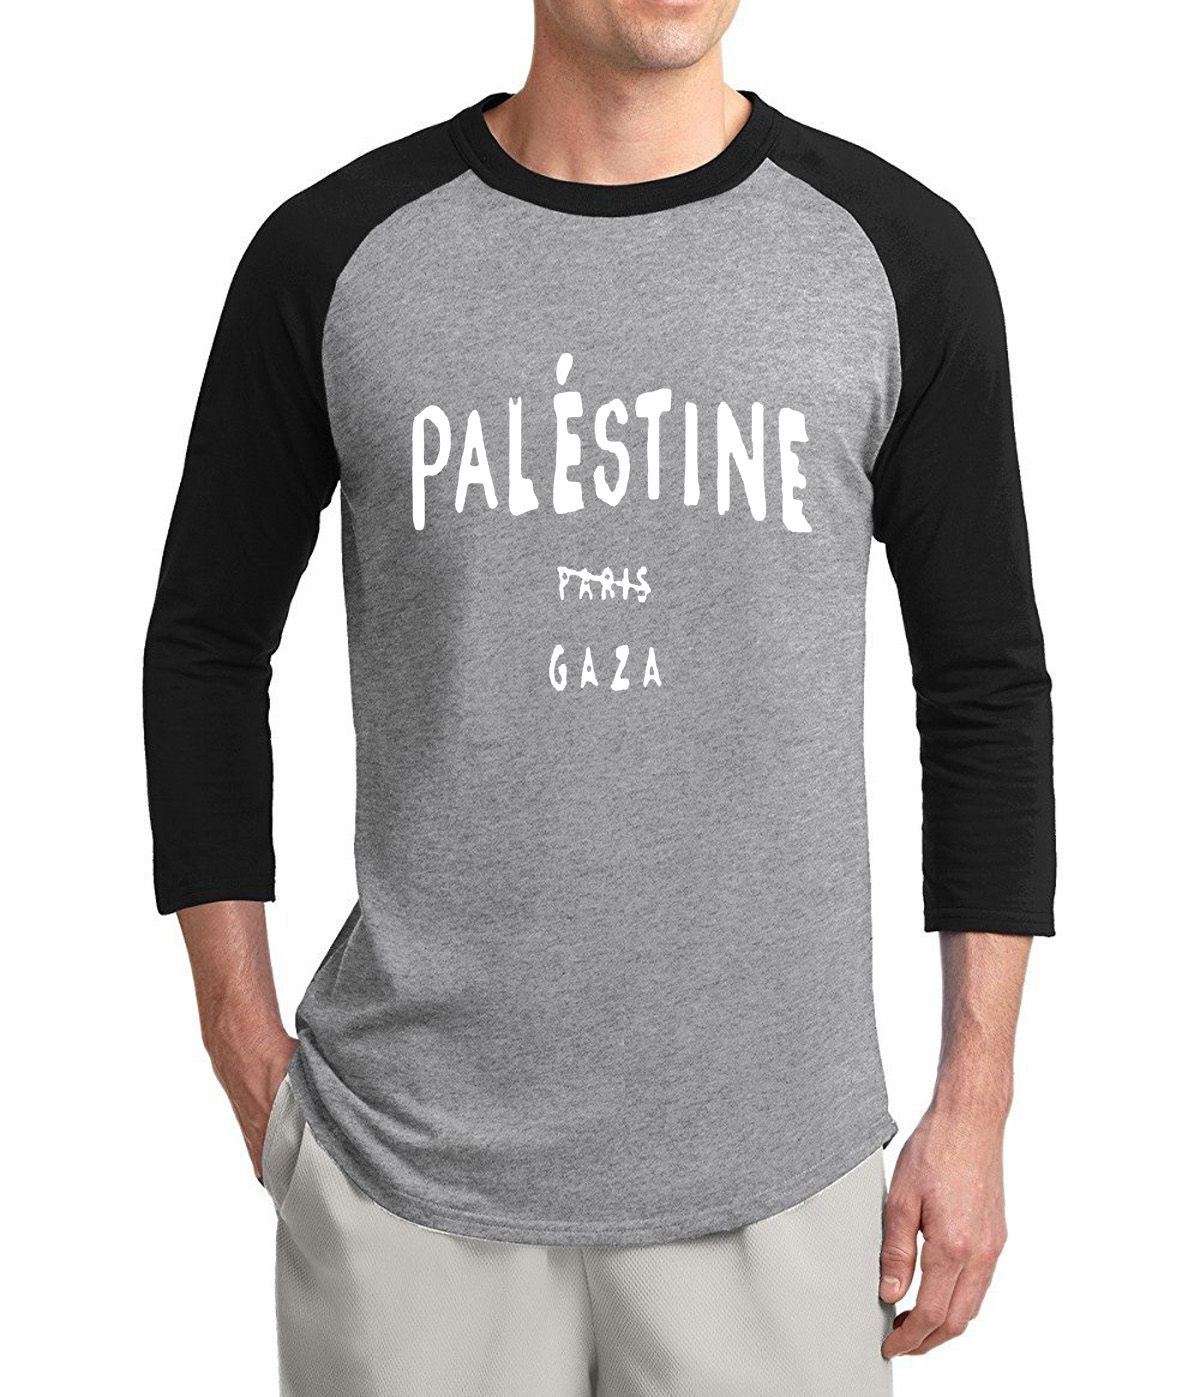 Gaza Palestine is not belong to paris funny 3/4 sleeve t shirts men 2017 summer 100% cotton raglan men t-shirt o-neck top tees #Affiliate